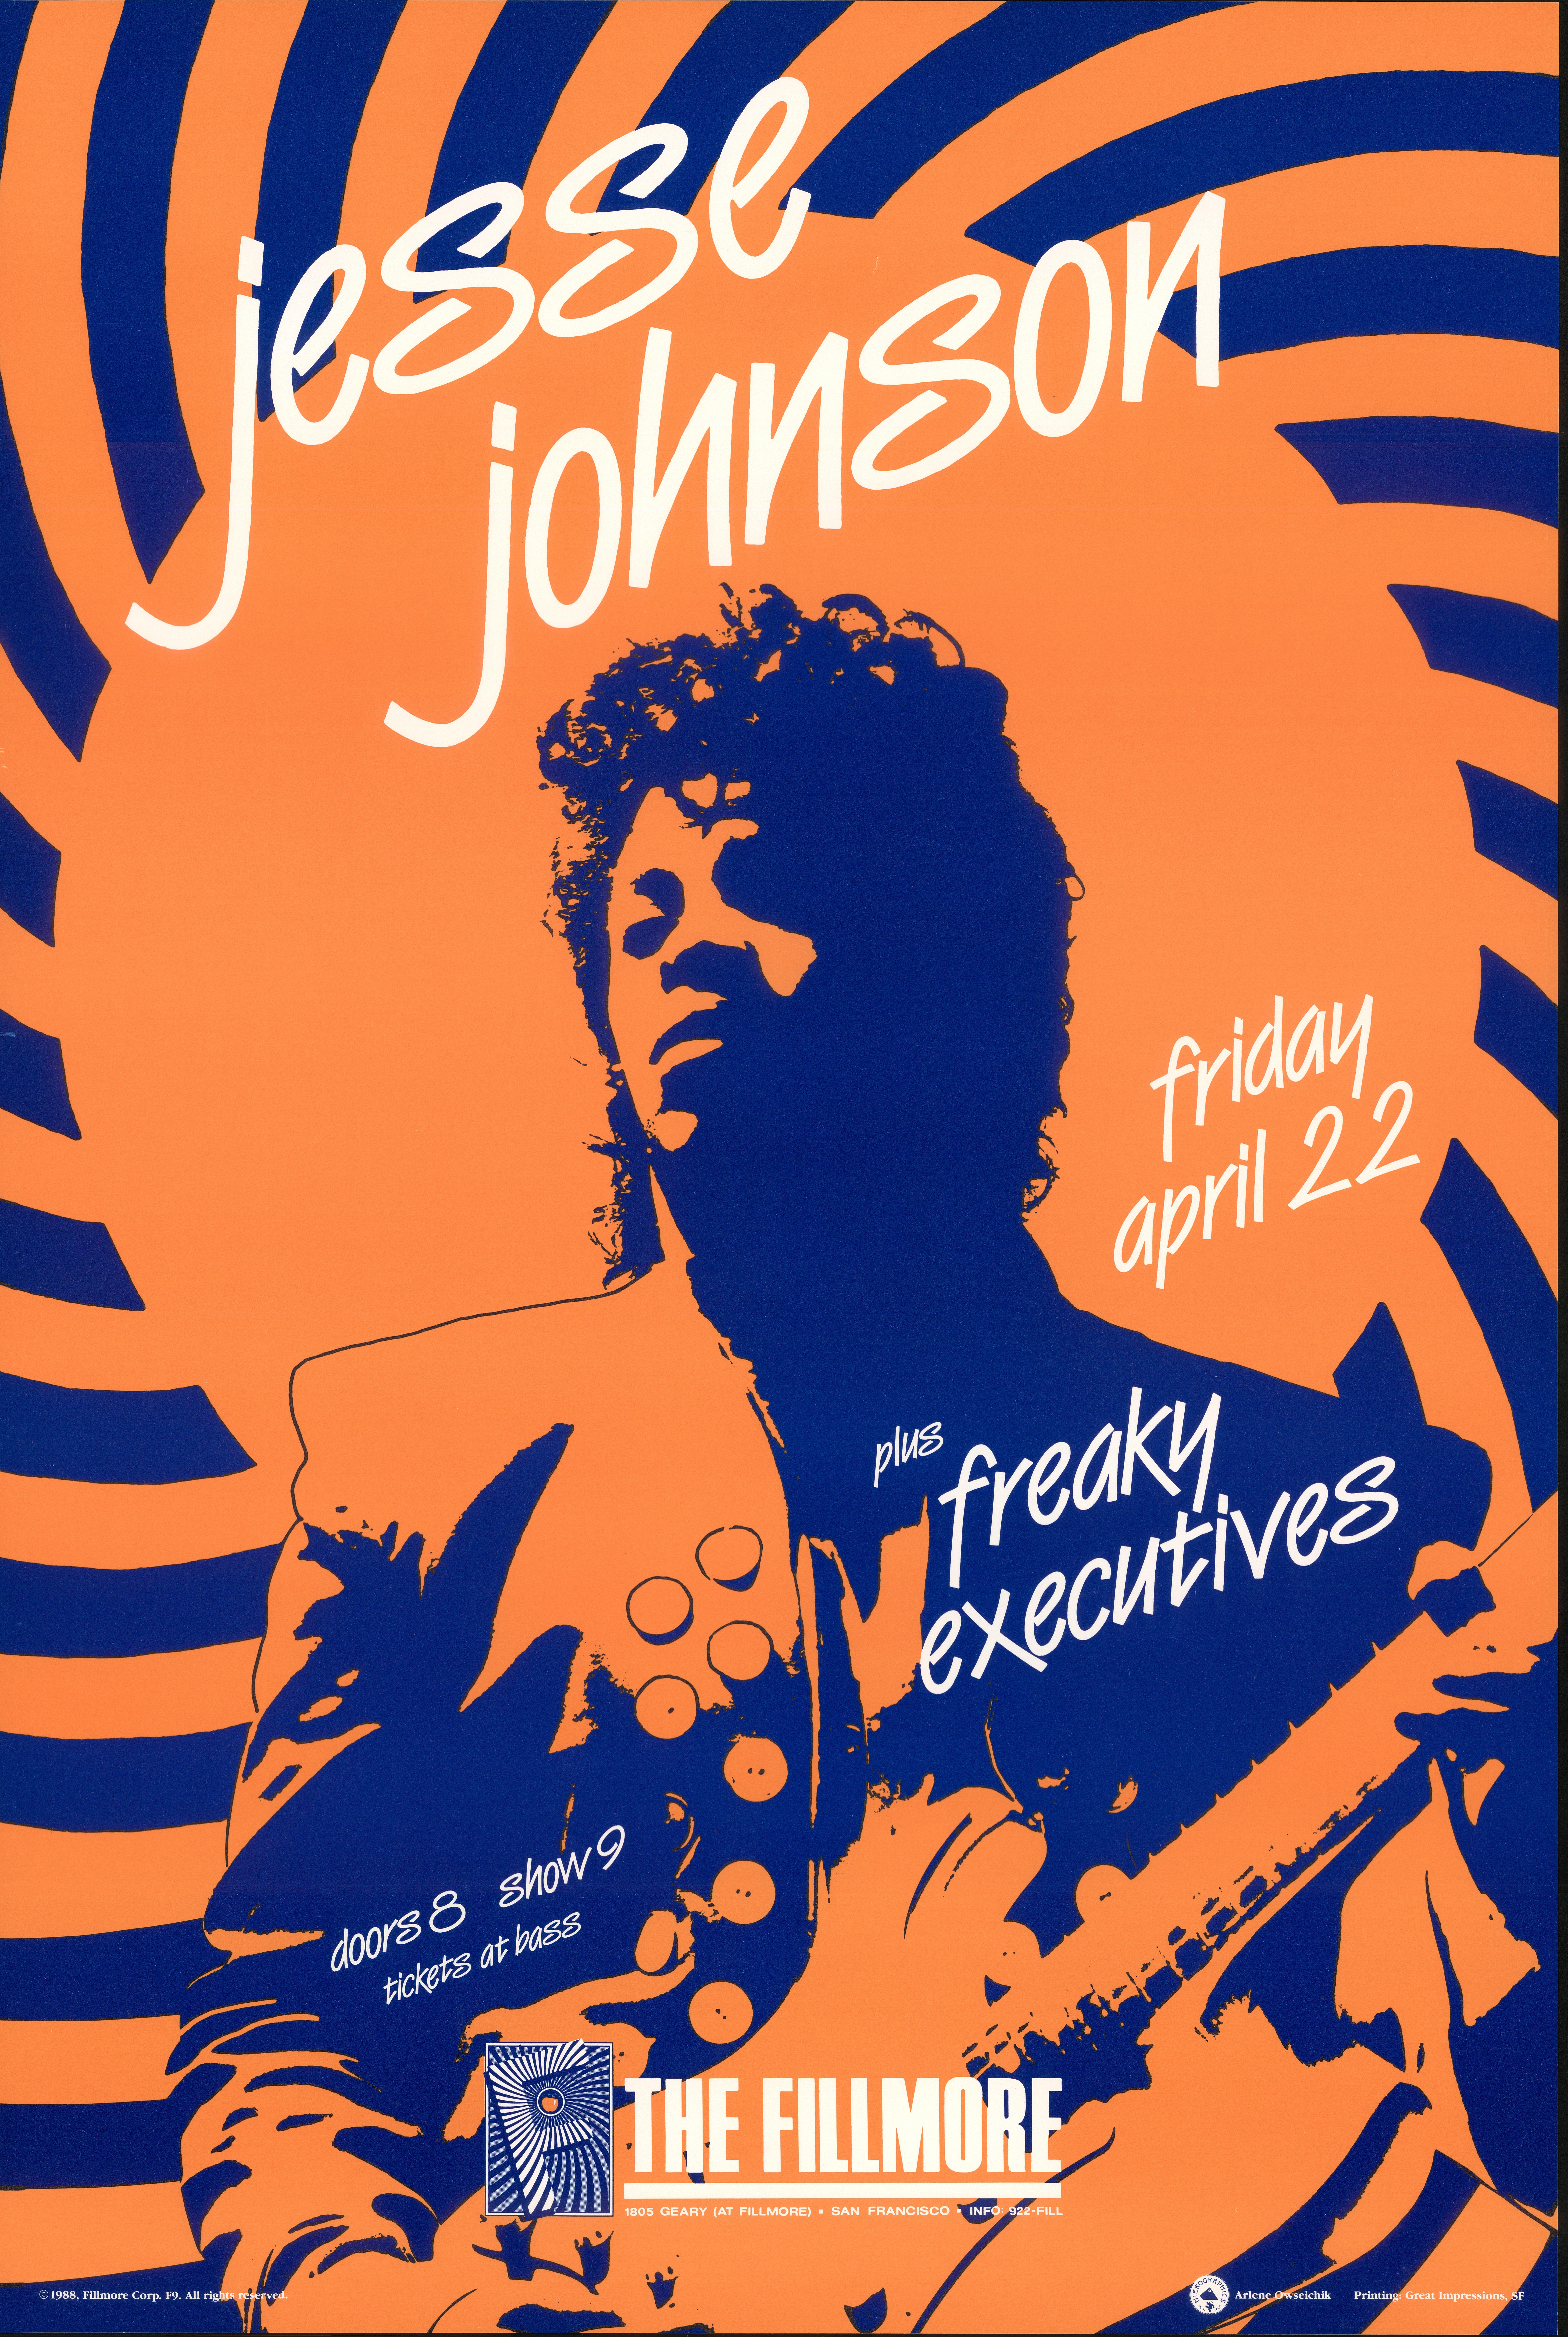 Jesse Johnson Poster